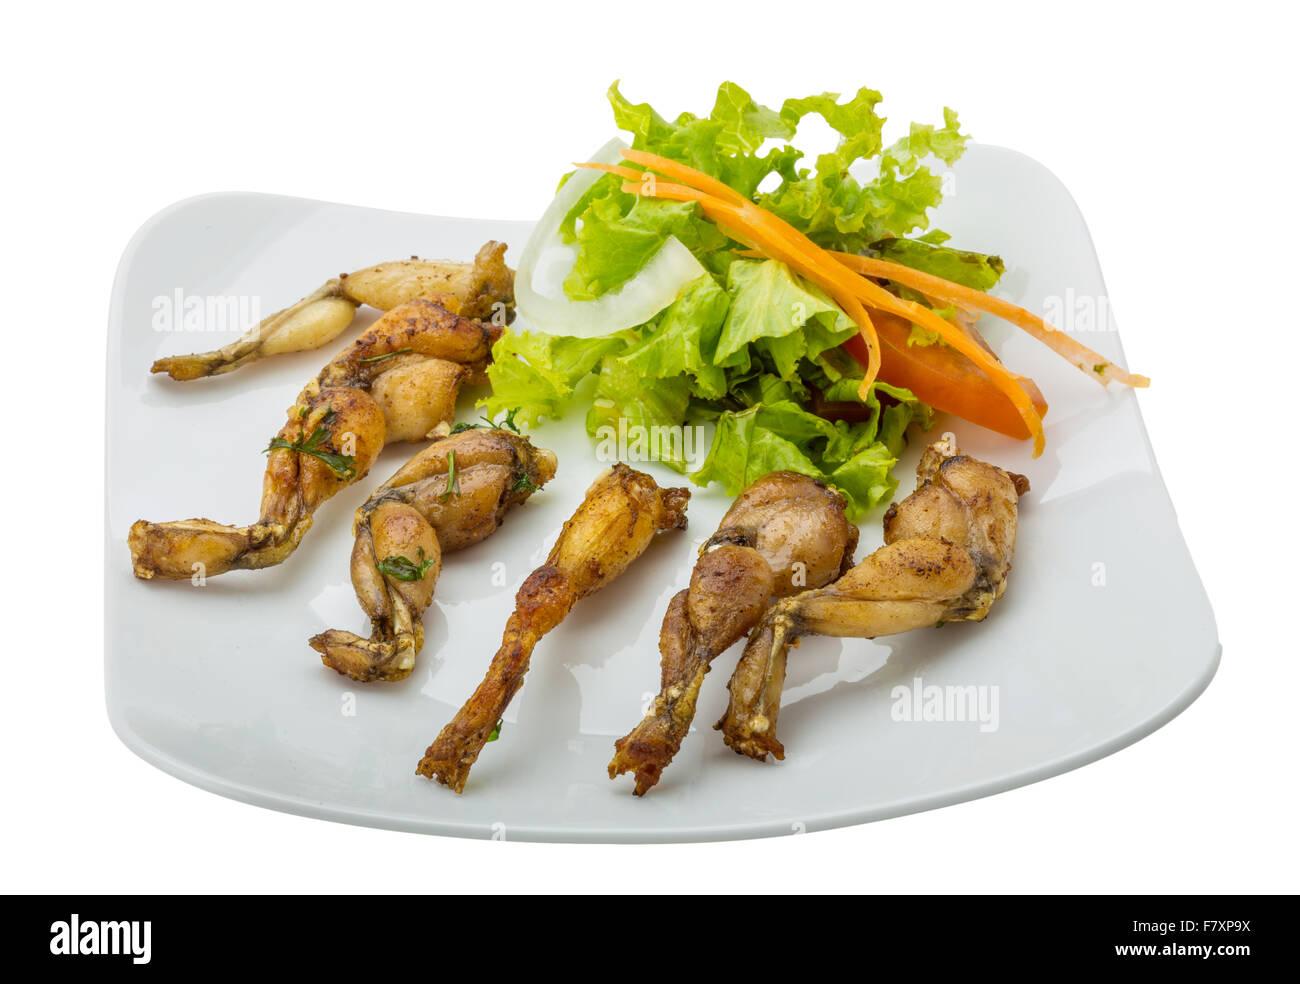 Französische küche froschschenkel  Eating Frog Legs Stockfotos & Eating Frog Legs Bilder - Alamy